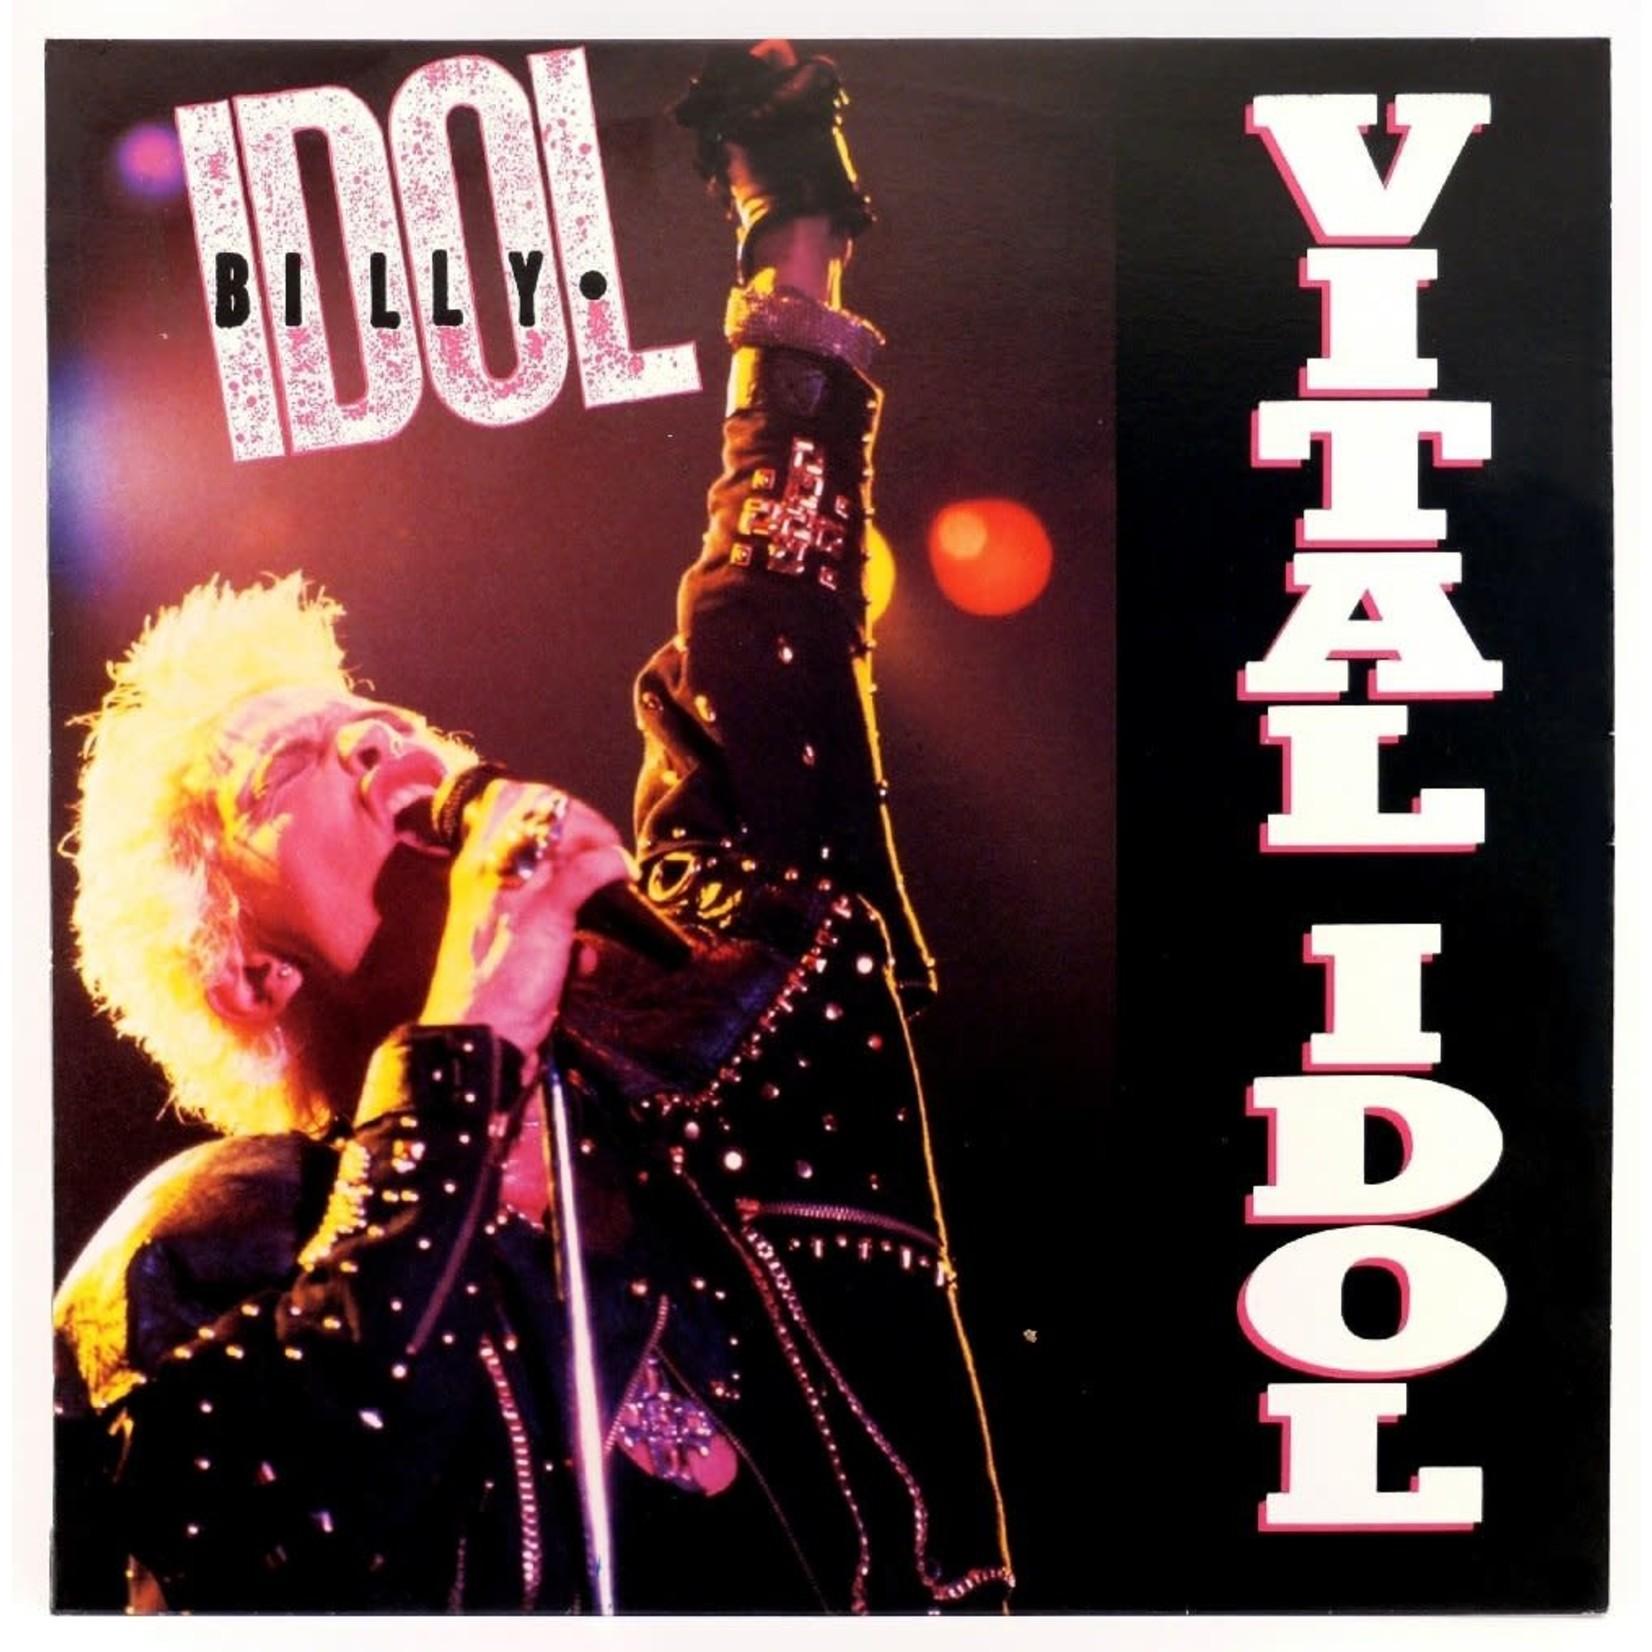 [Vintage] Idol, Billy: Vital Idol (compilation)